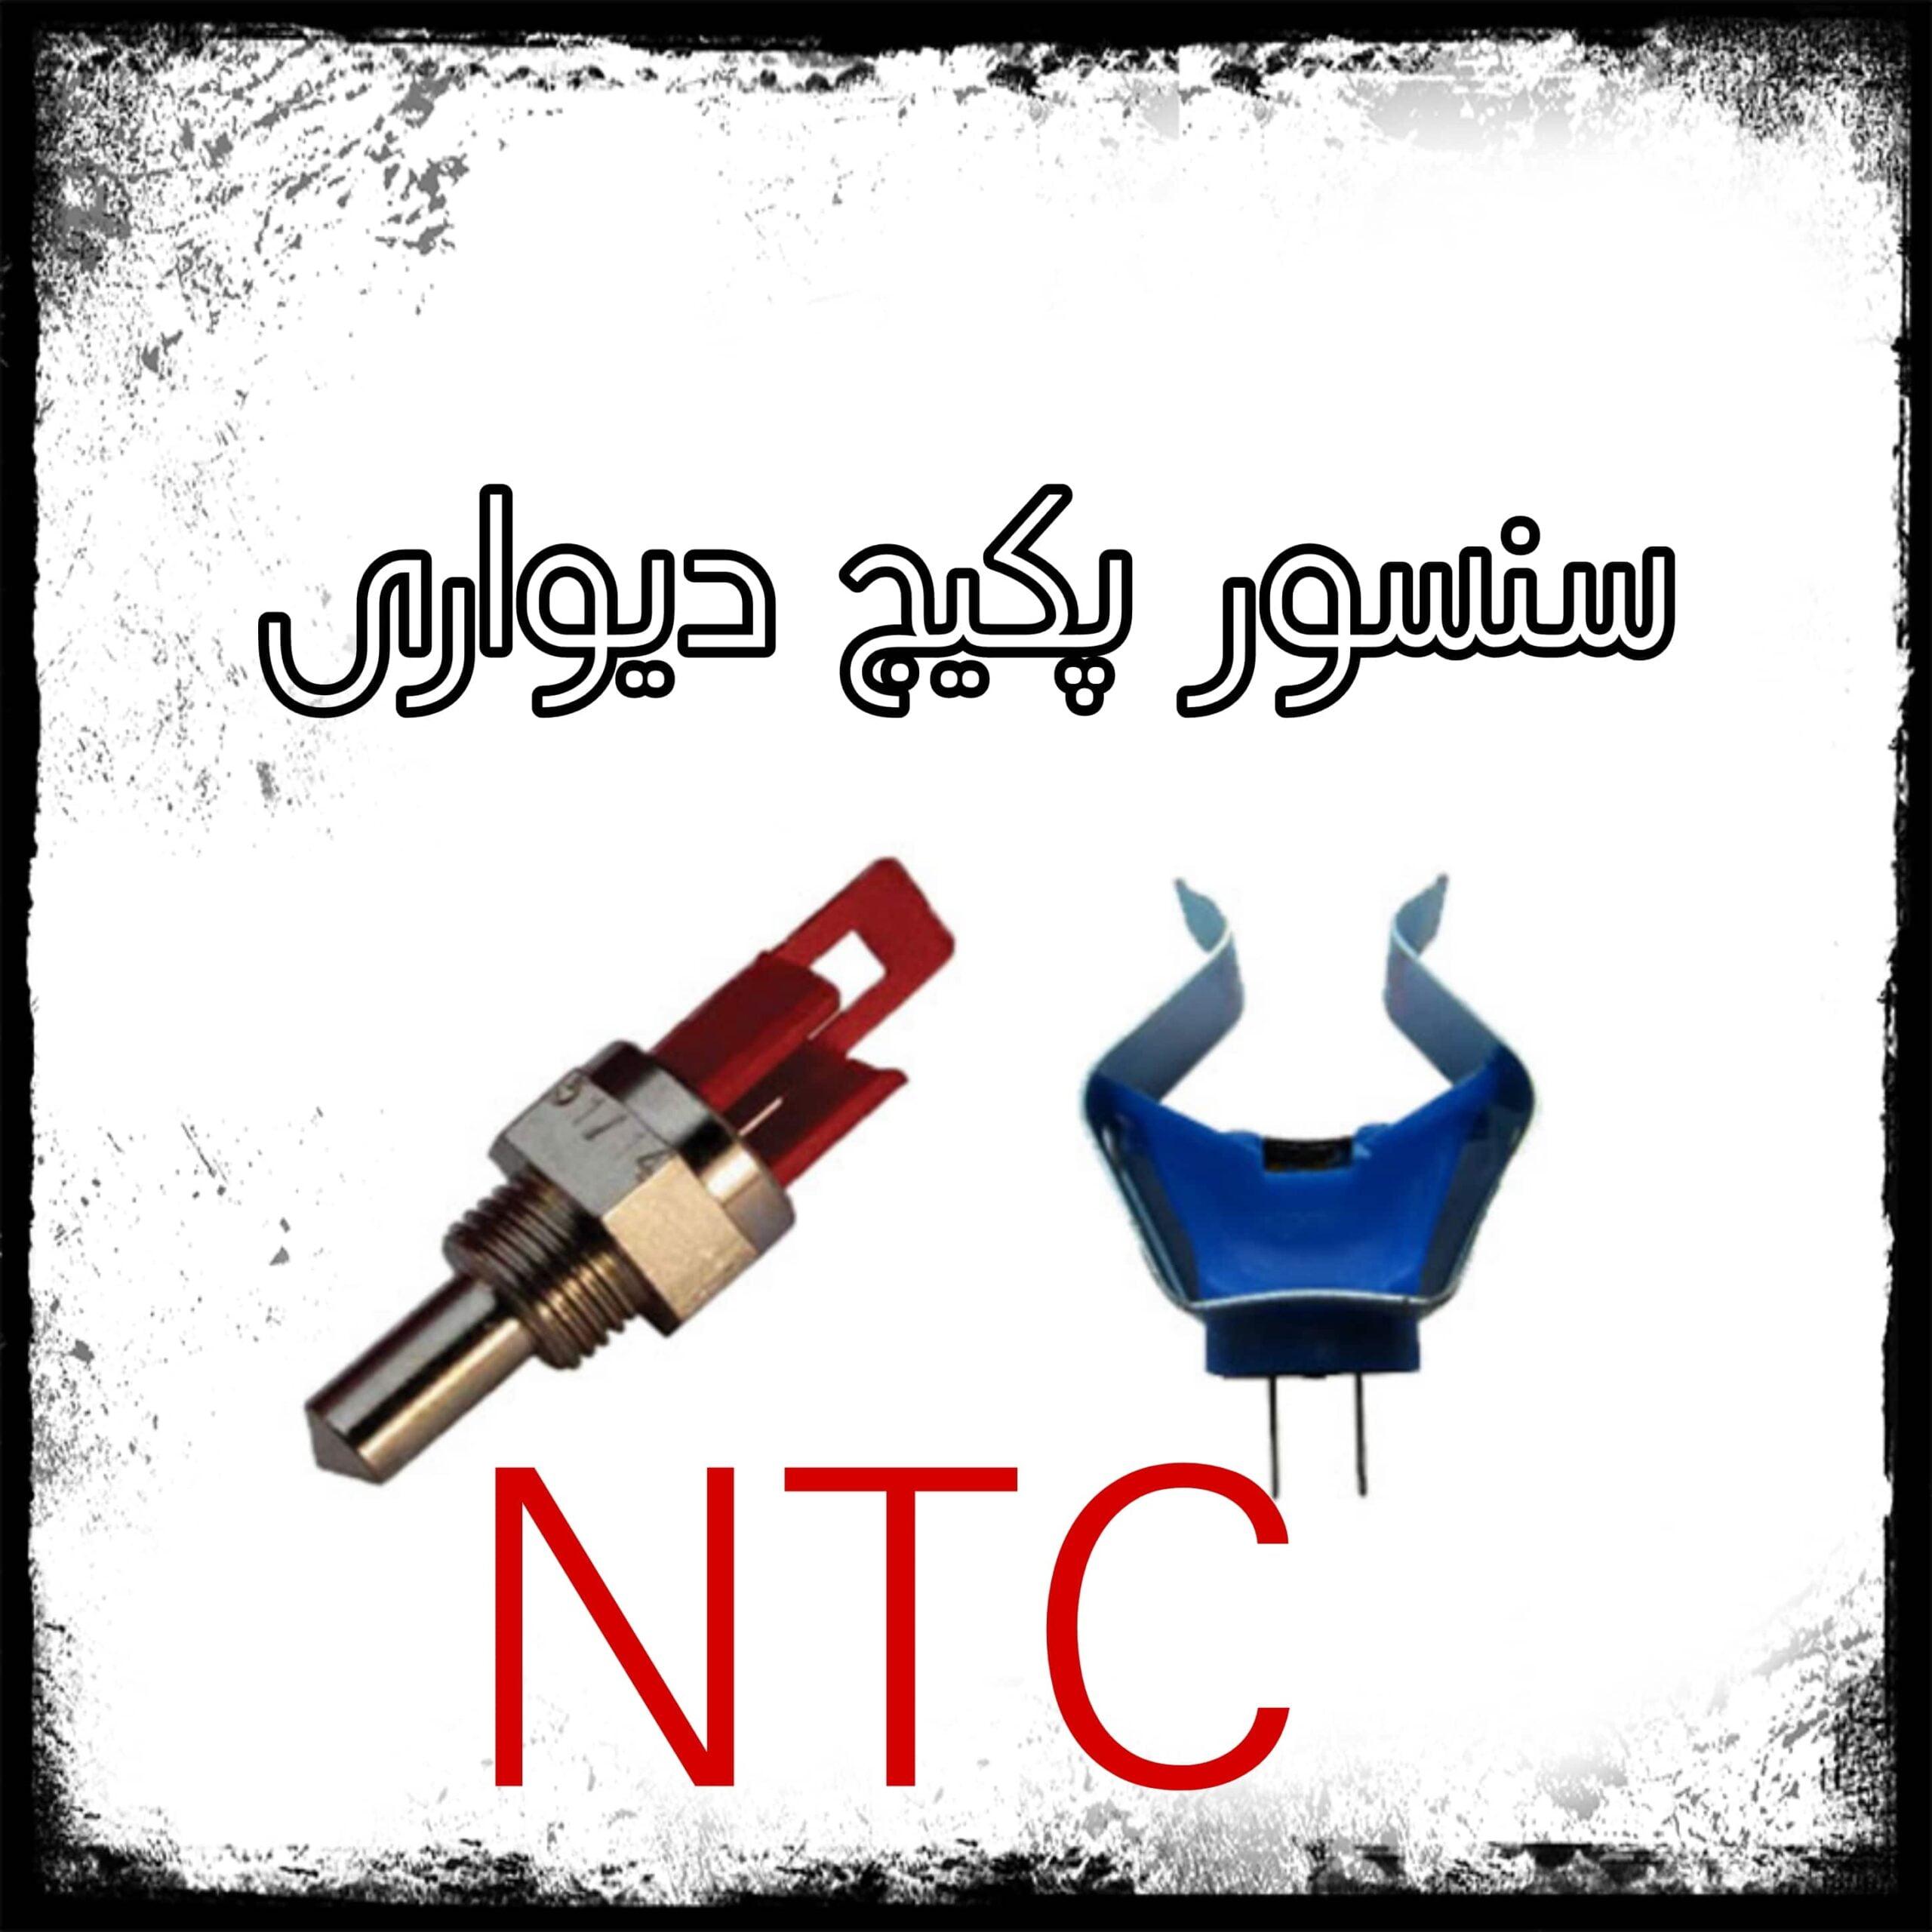 سنسور NTC پکیج دیواری